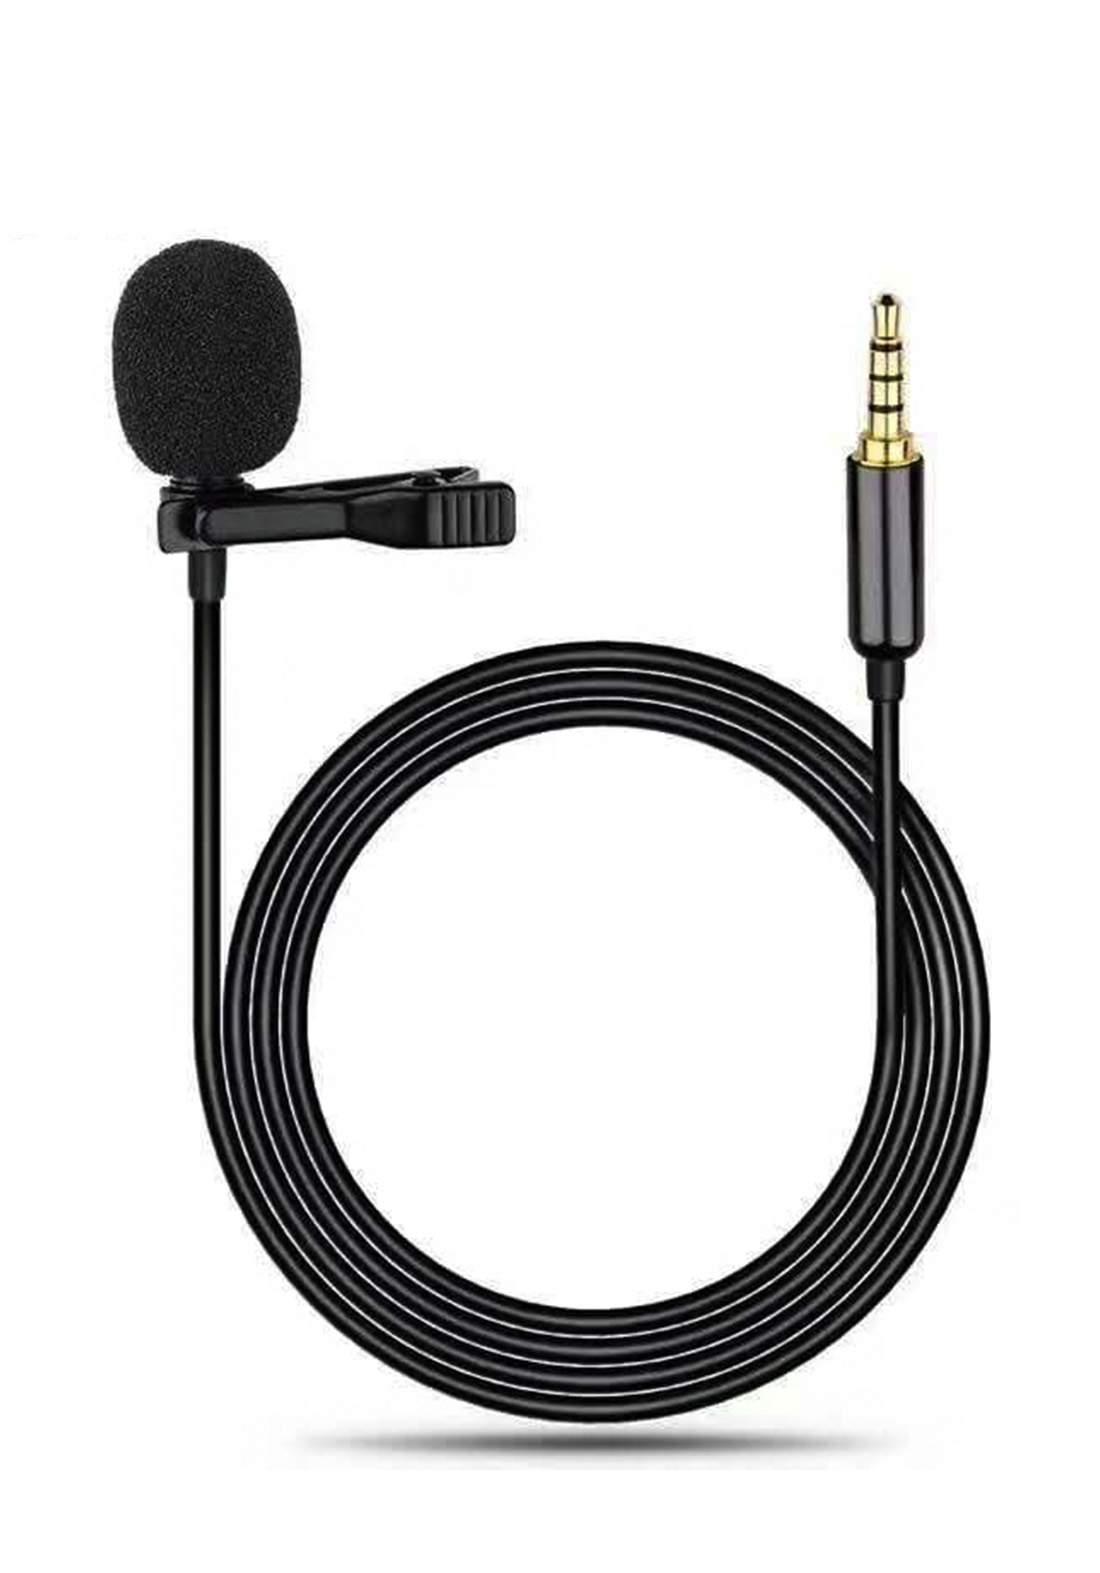 REMAX RL-LF31 Micdo Series 3.5mm Jack Clip Microphone - Black مايكرفون